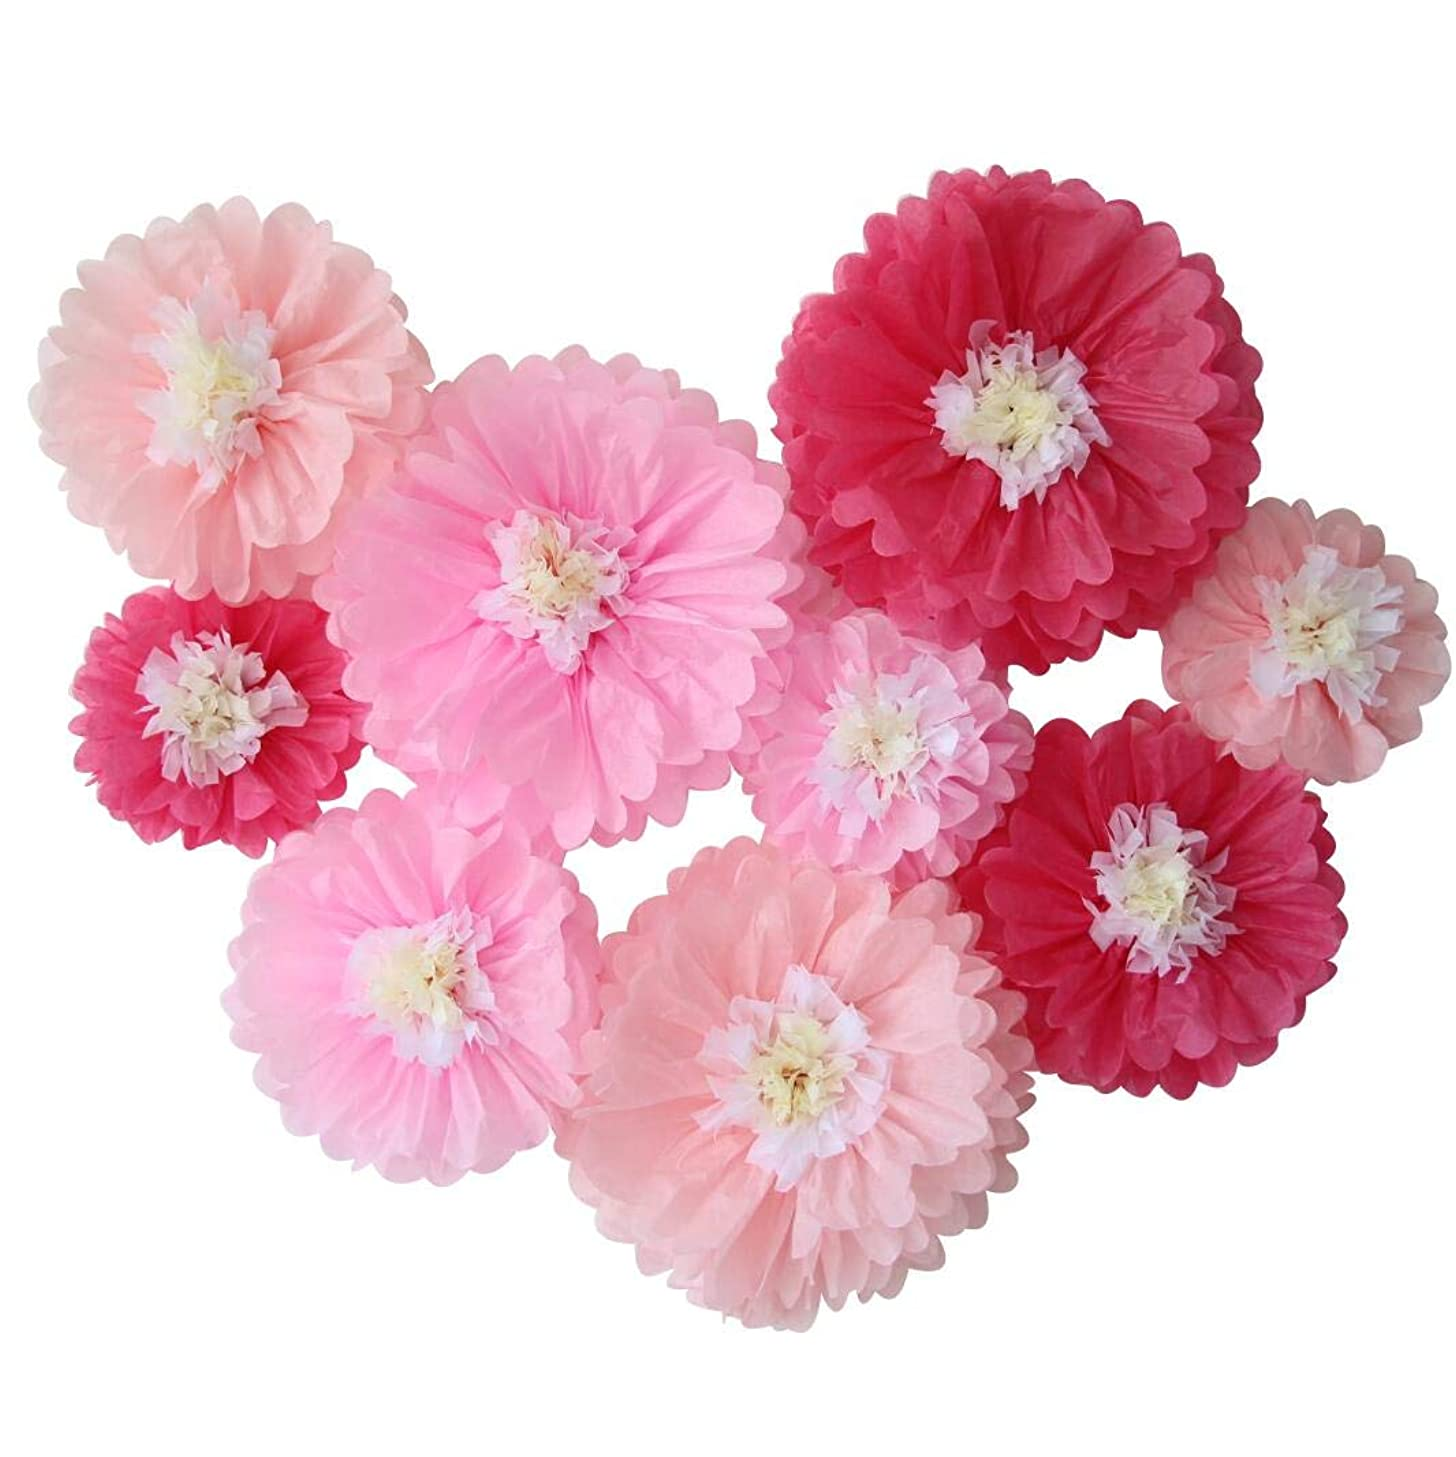 Mybbshower Pink Nursery Paper Flowers Wall Decoration Elegant Craft Eedding Backdrop Decor Pack of 9